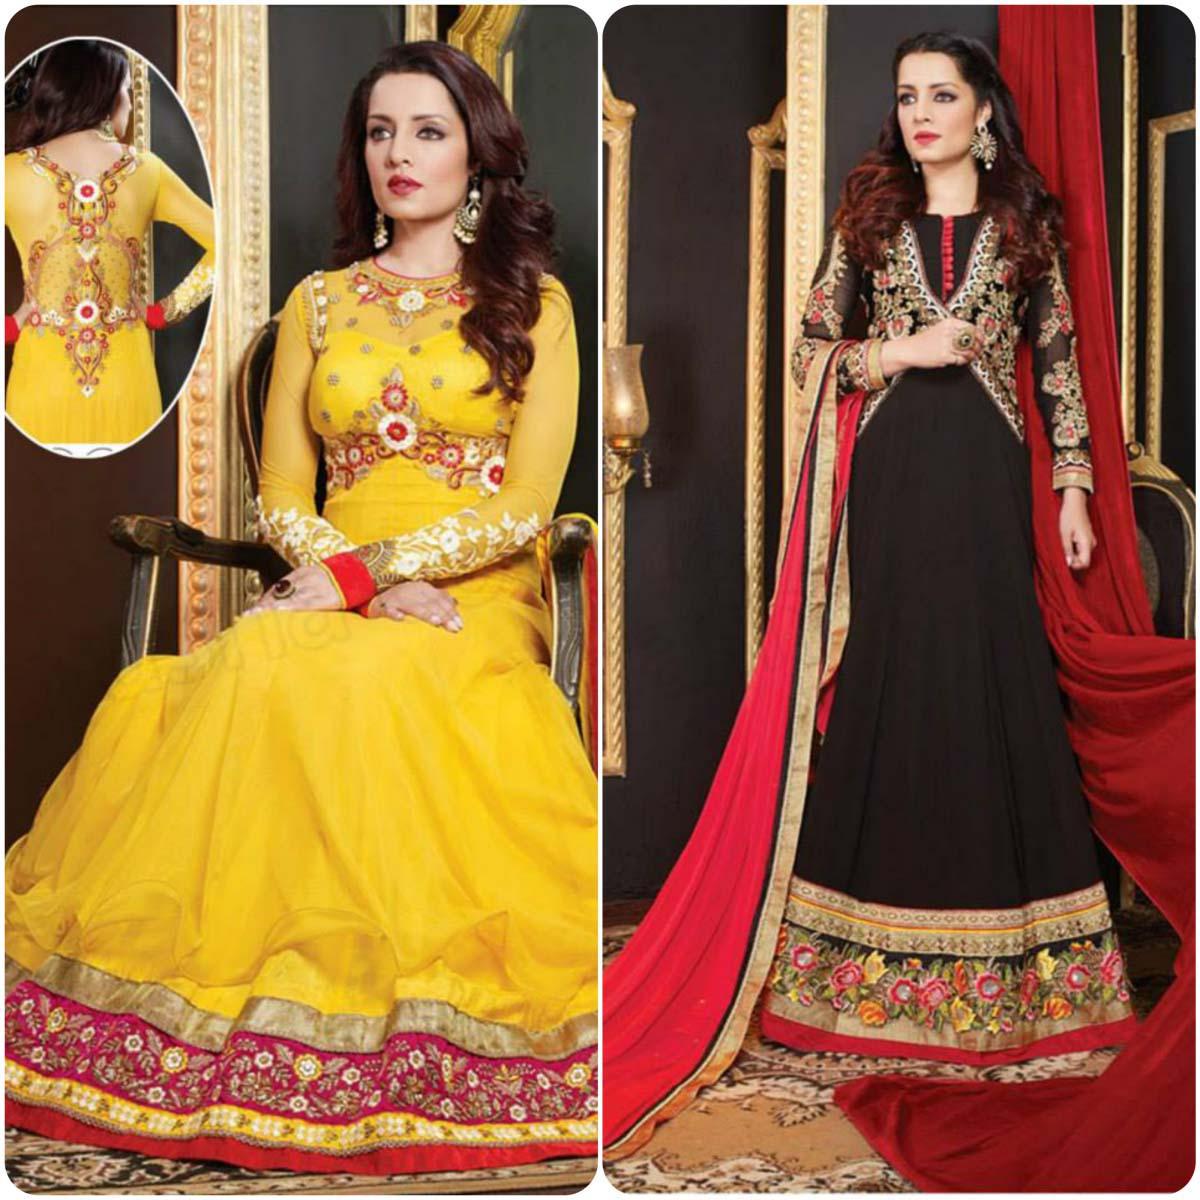 Natasha Couture Latest Indian Anarkali Dress Desigs Collection 2016-2017...styloplanet (8)